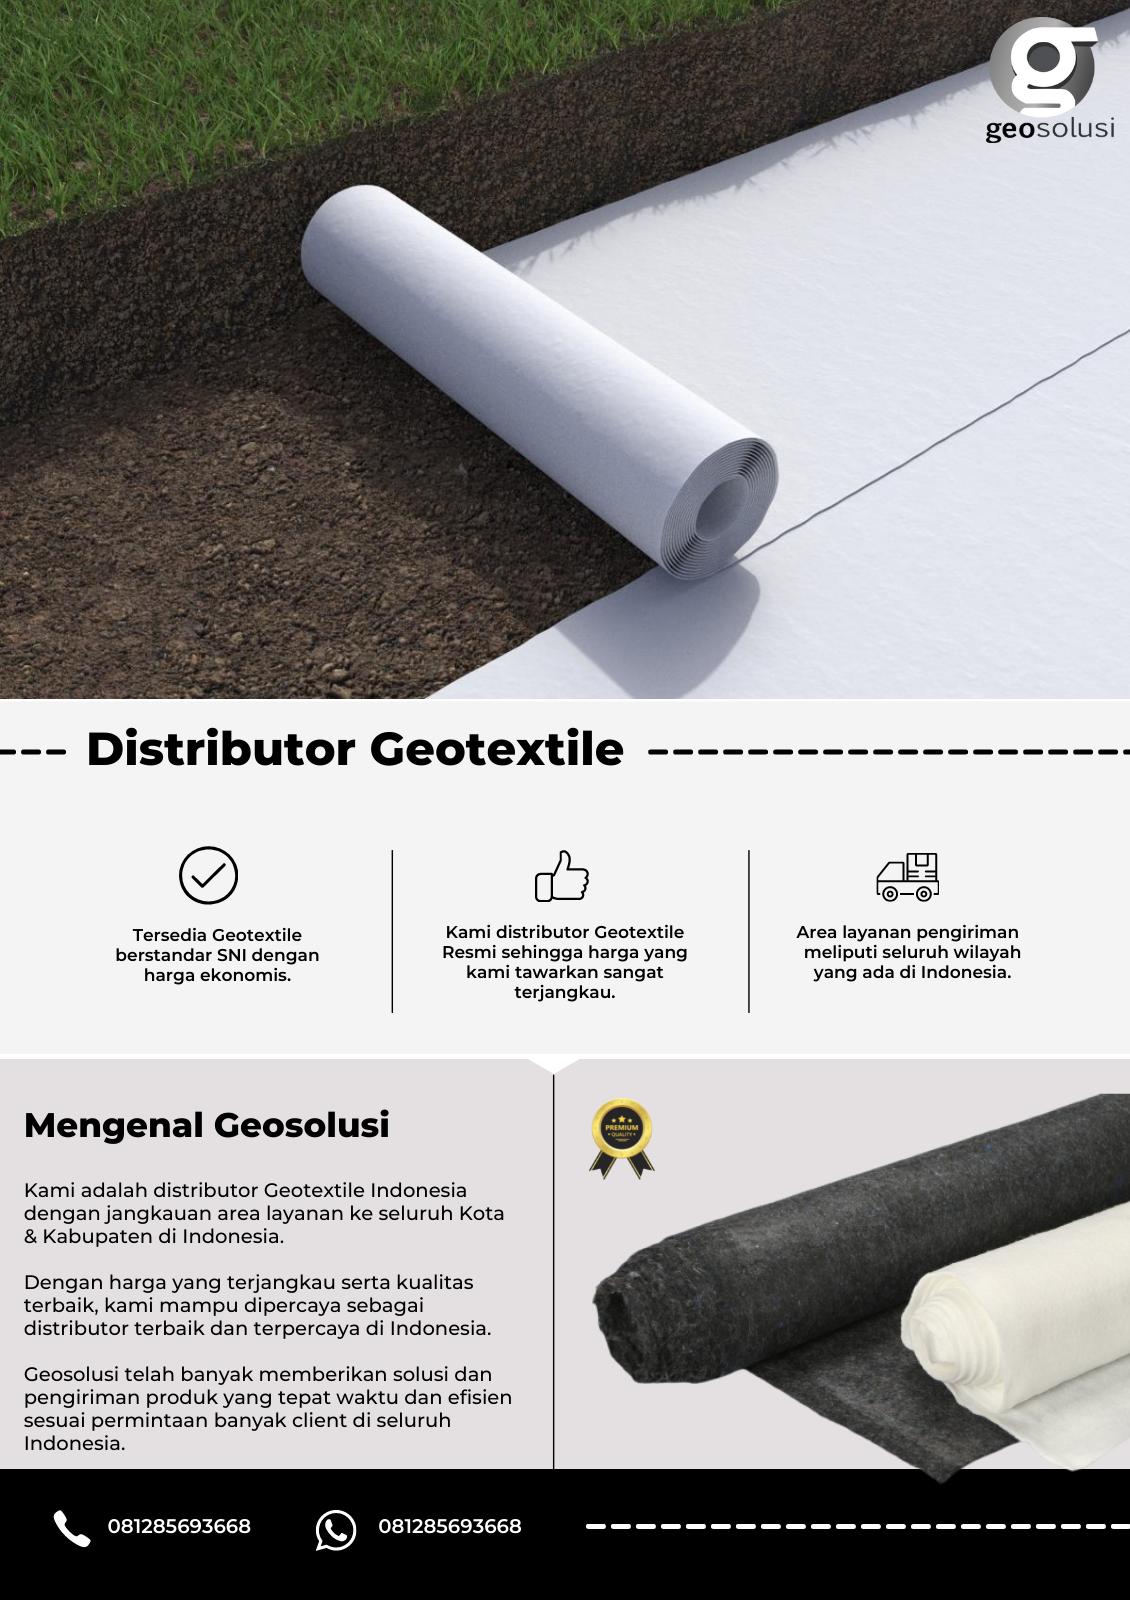 Distributor Geotextile.